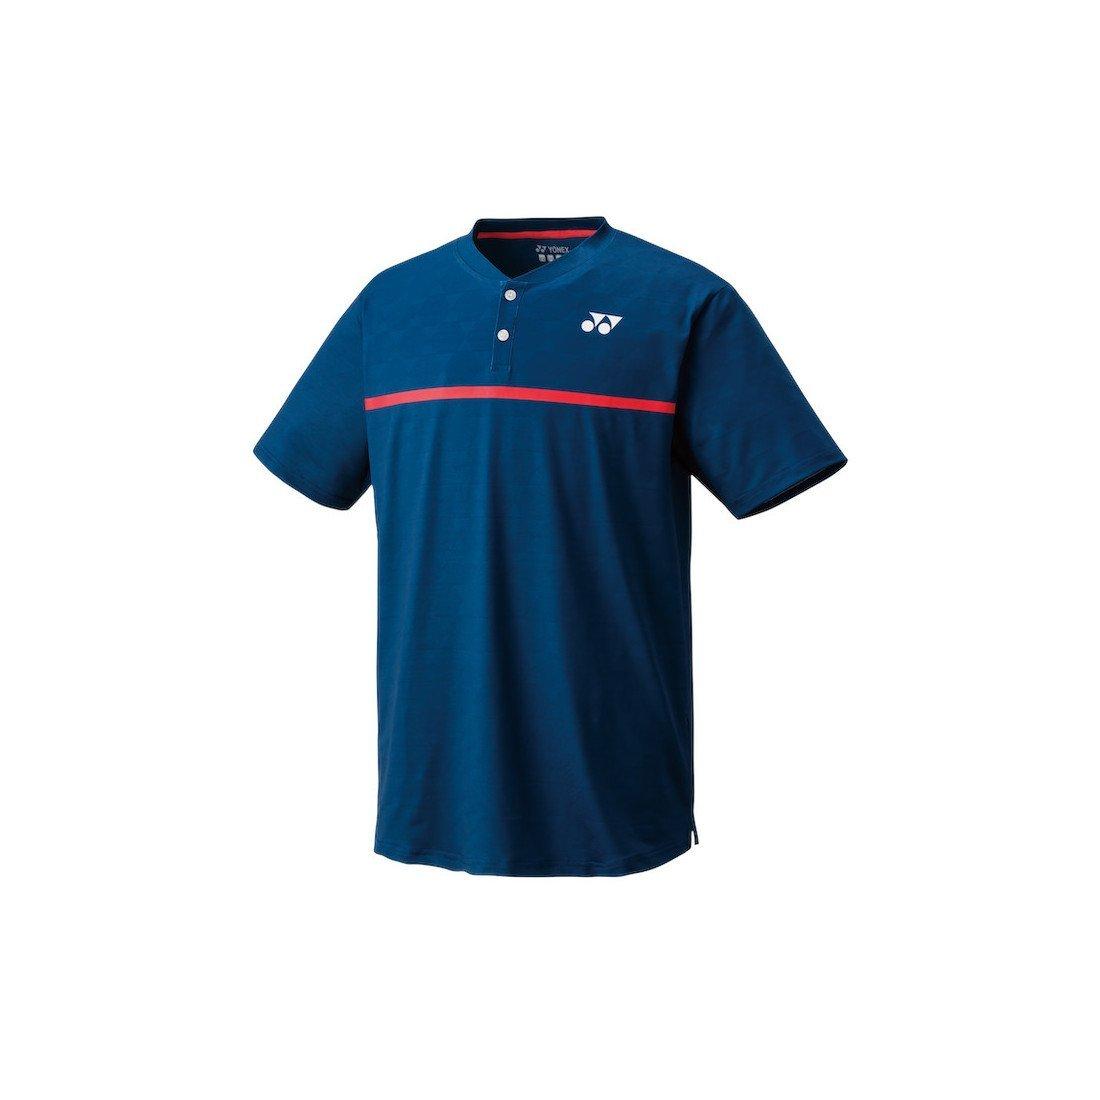 Yonex Men's Henley Tennis Shirt Slim Fit – Indigo Blue